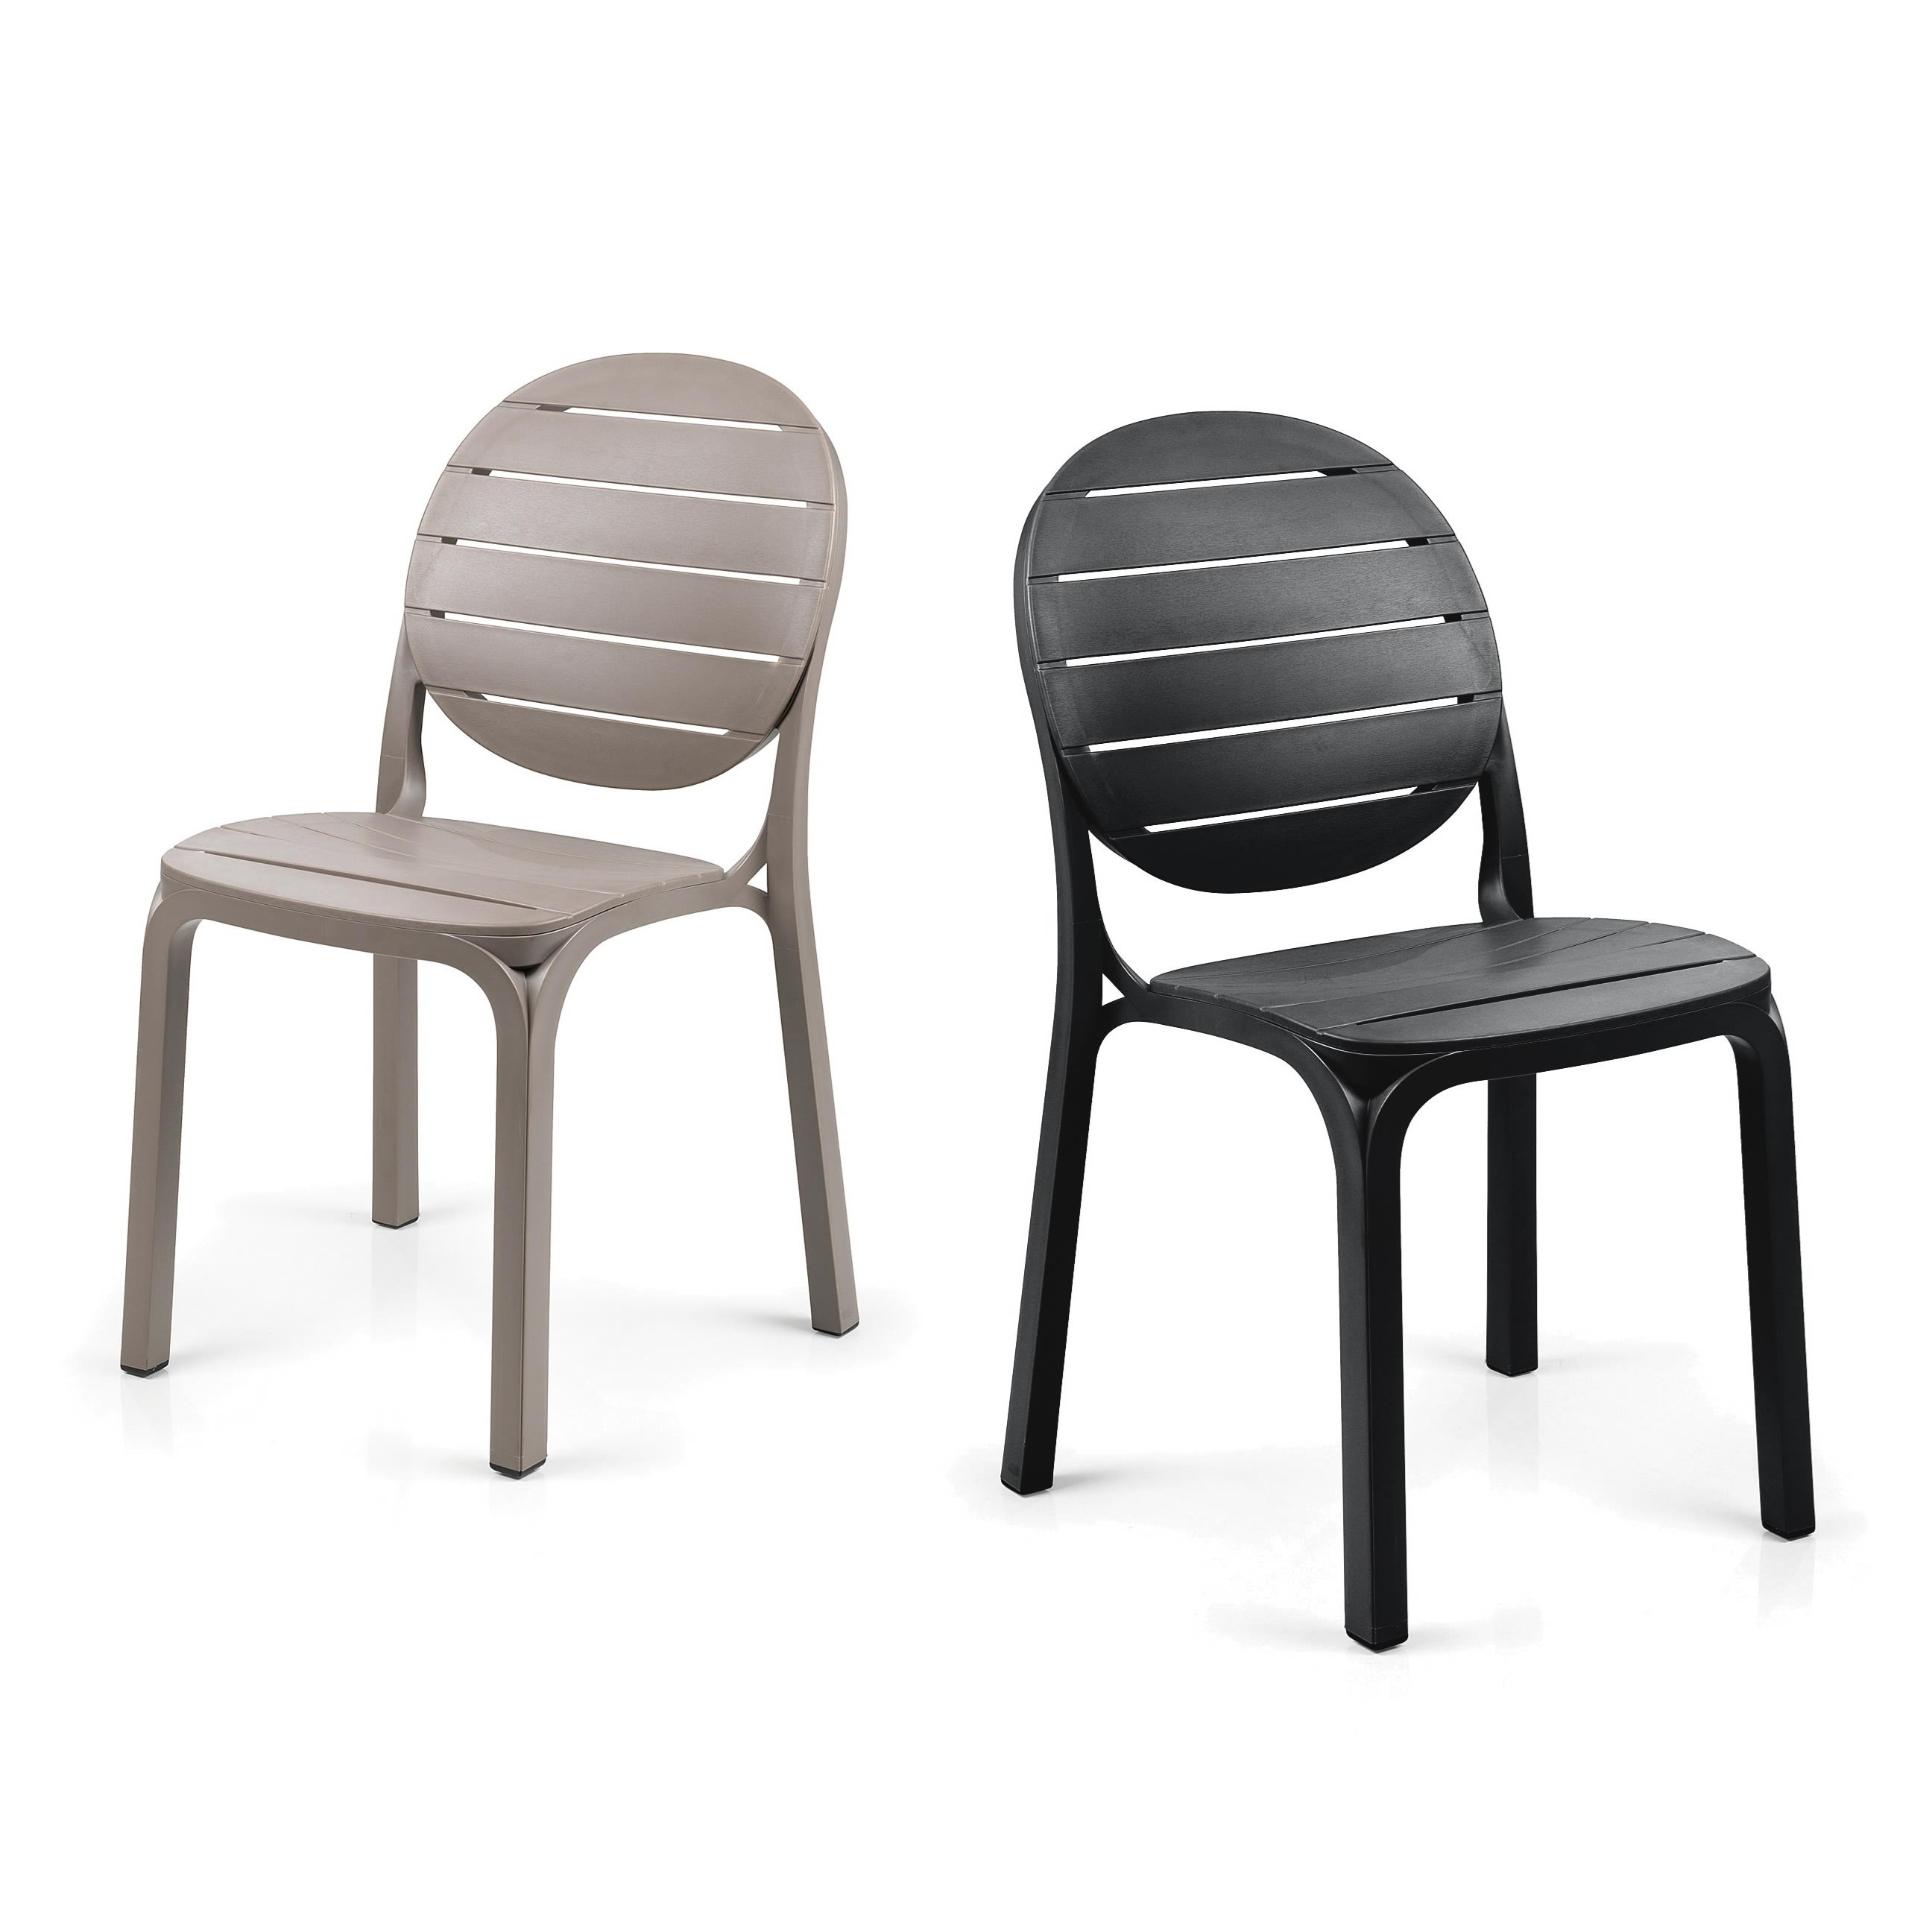 Sedia per esterni in resina erica nardi for Feltrini antirumore per sedie